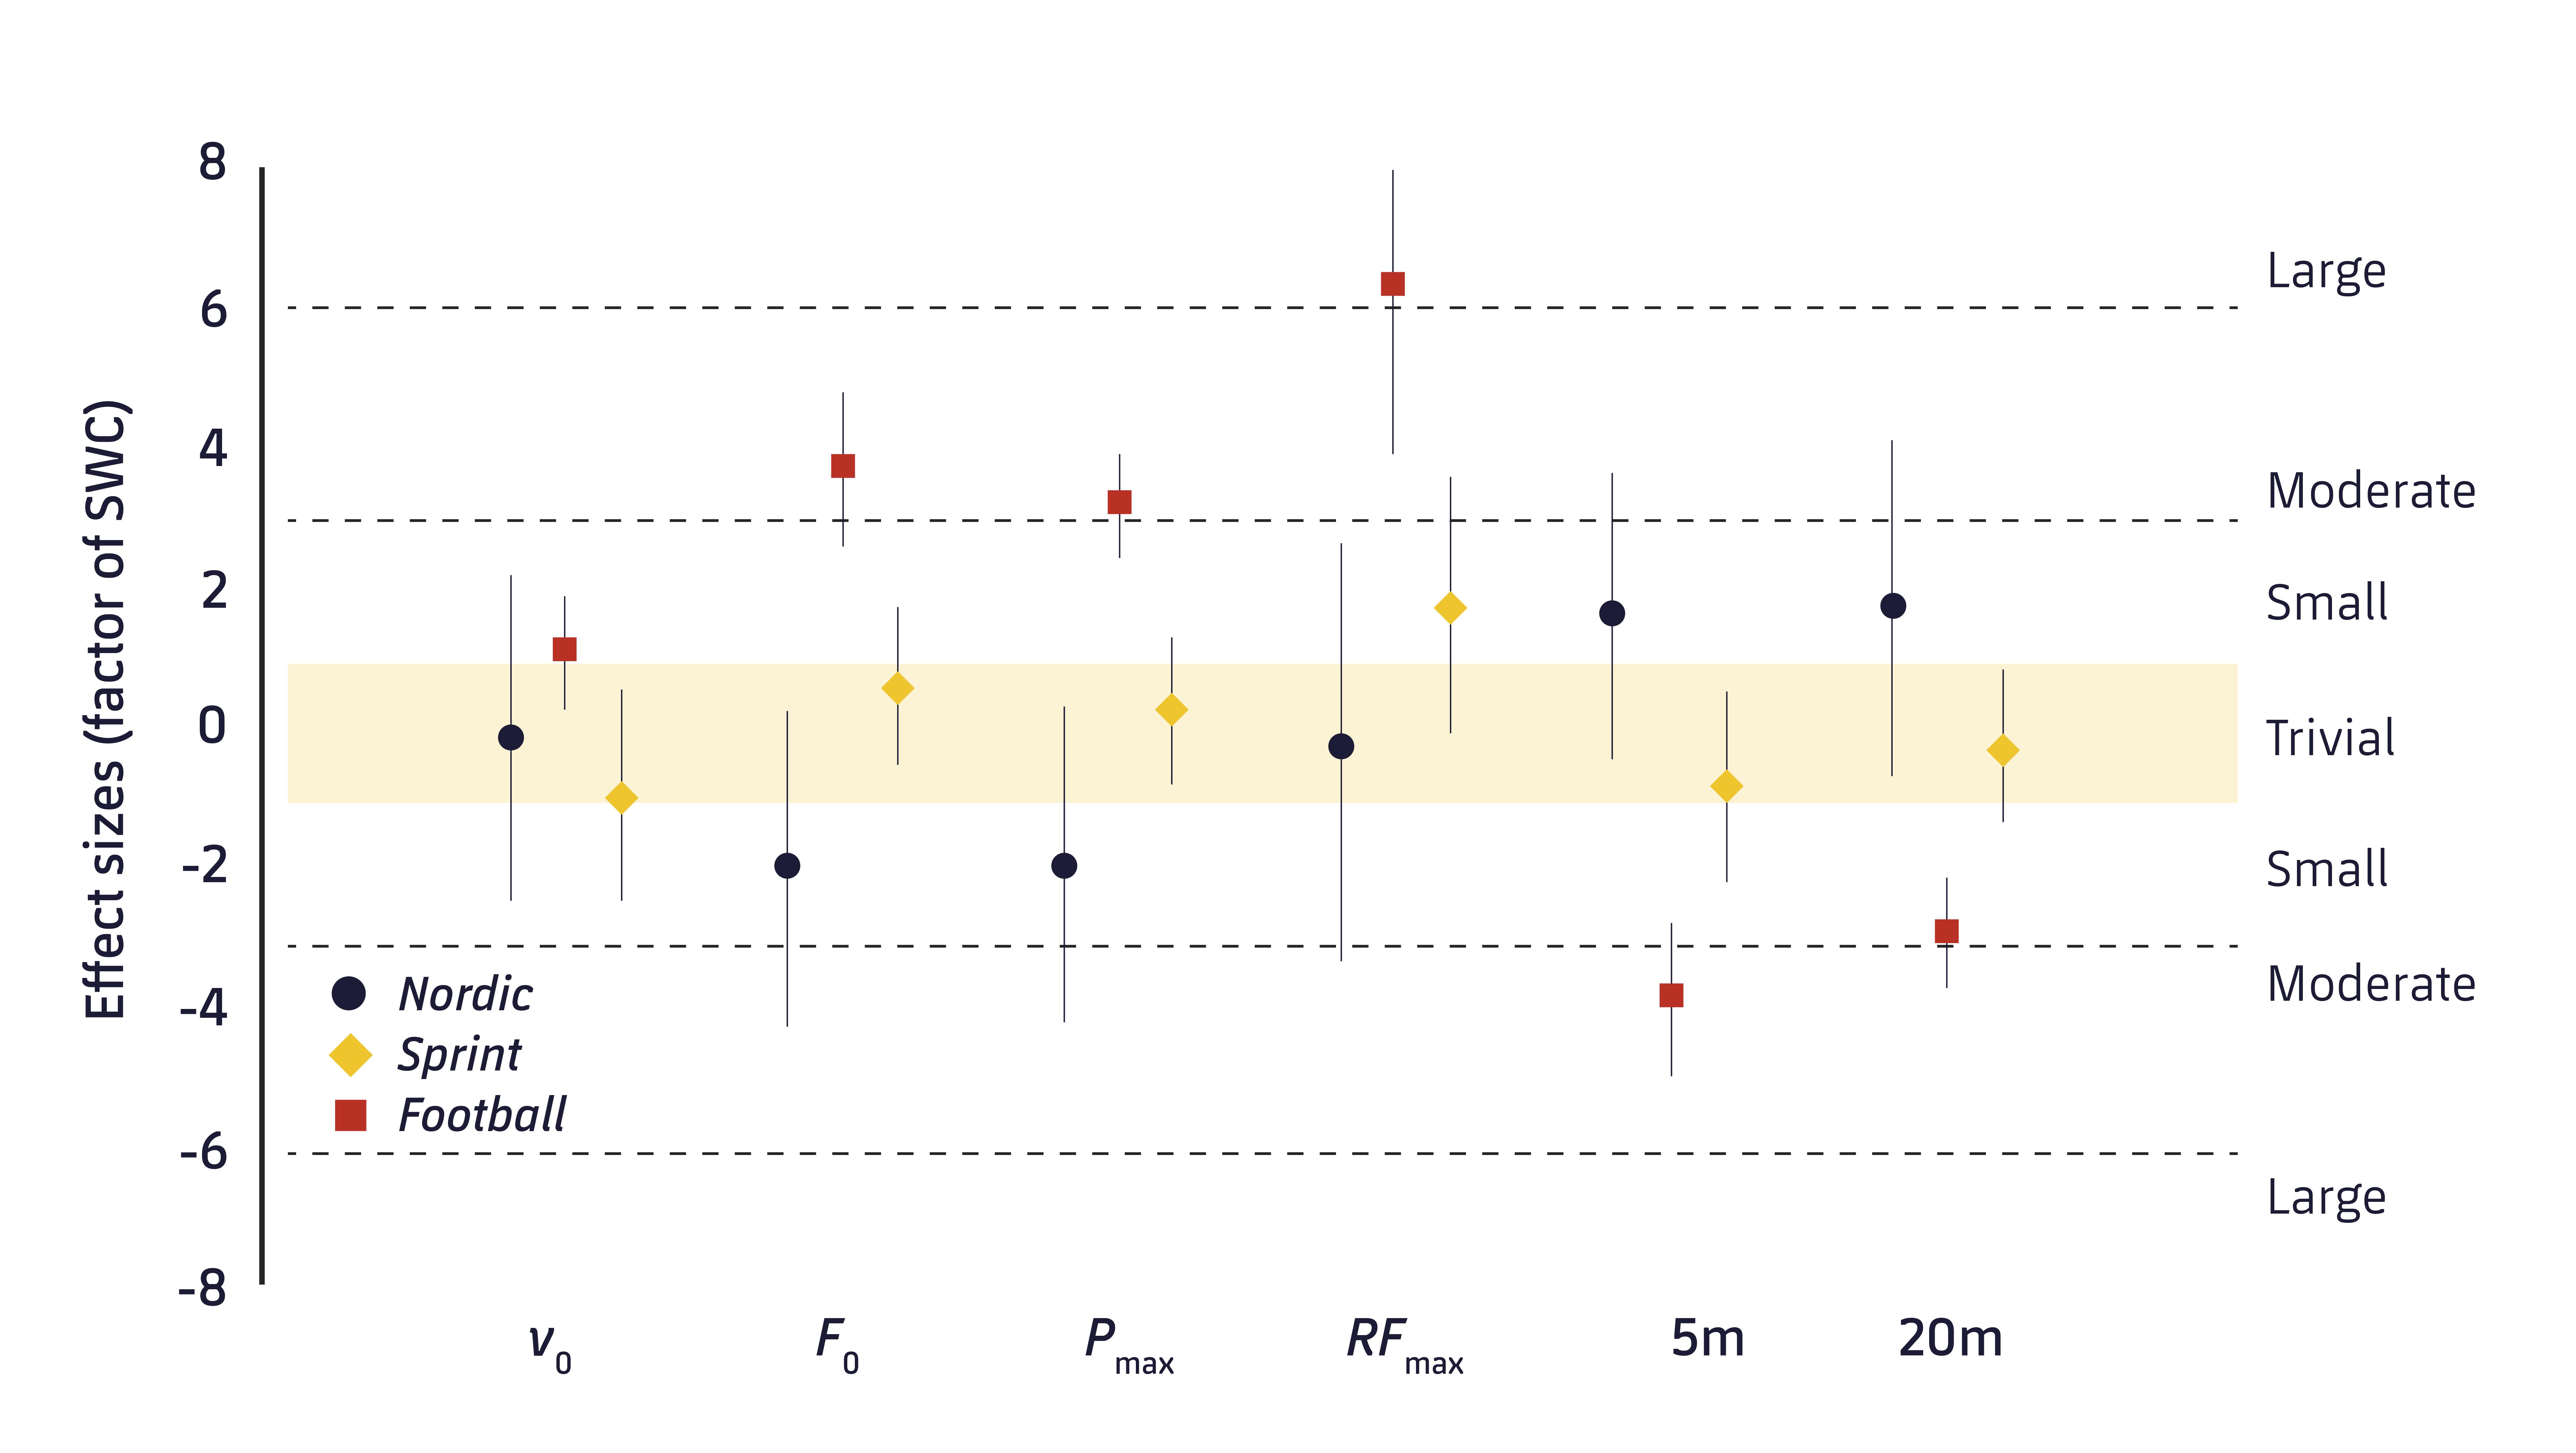 Figure 1. Magnitude of pre and post changes in sprint performance. v0: Maximum speed; F0 = maximum force; Pmax = maximum power; RFmax = maximum value of the force ratio; 5 m: sprint time of 5 m; 20 m: sprint time of 20 m.9